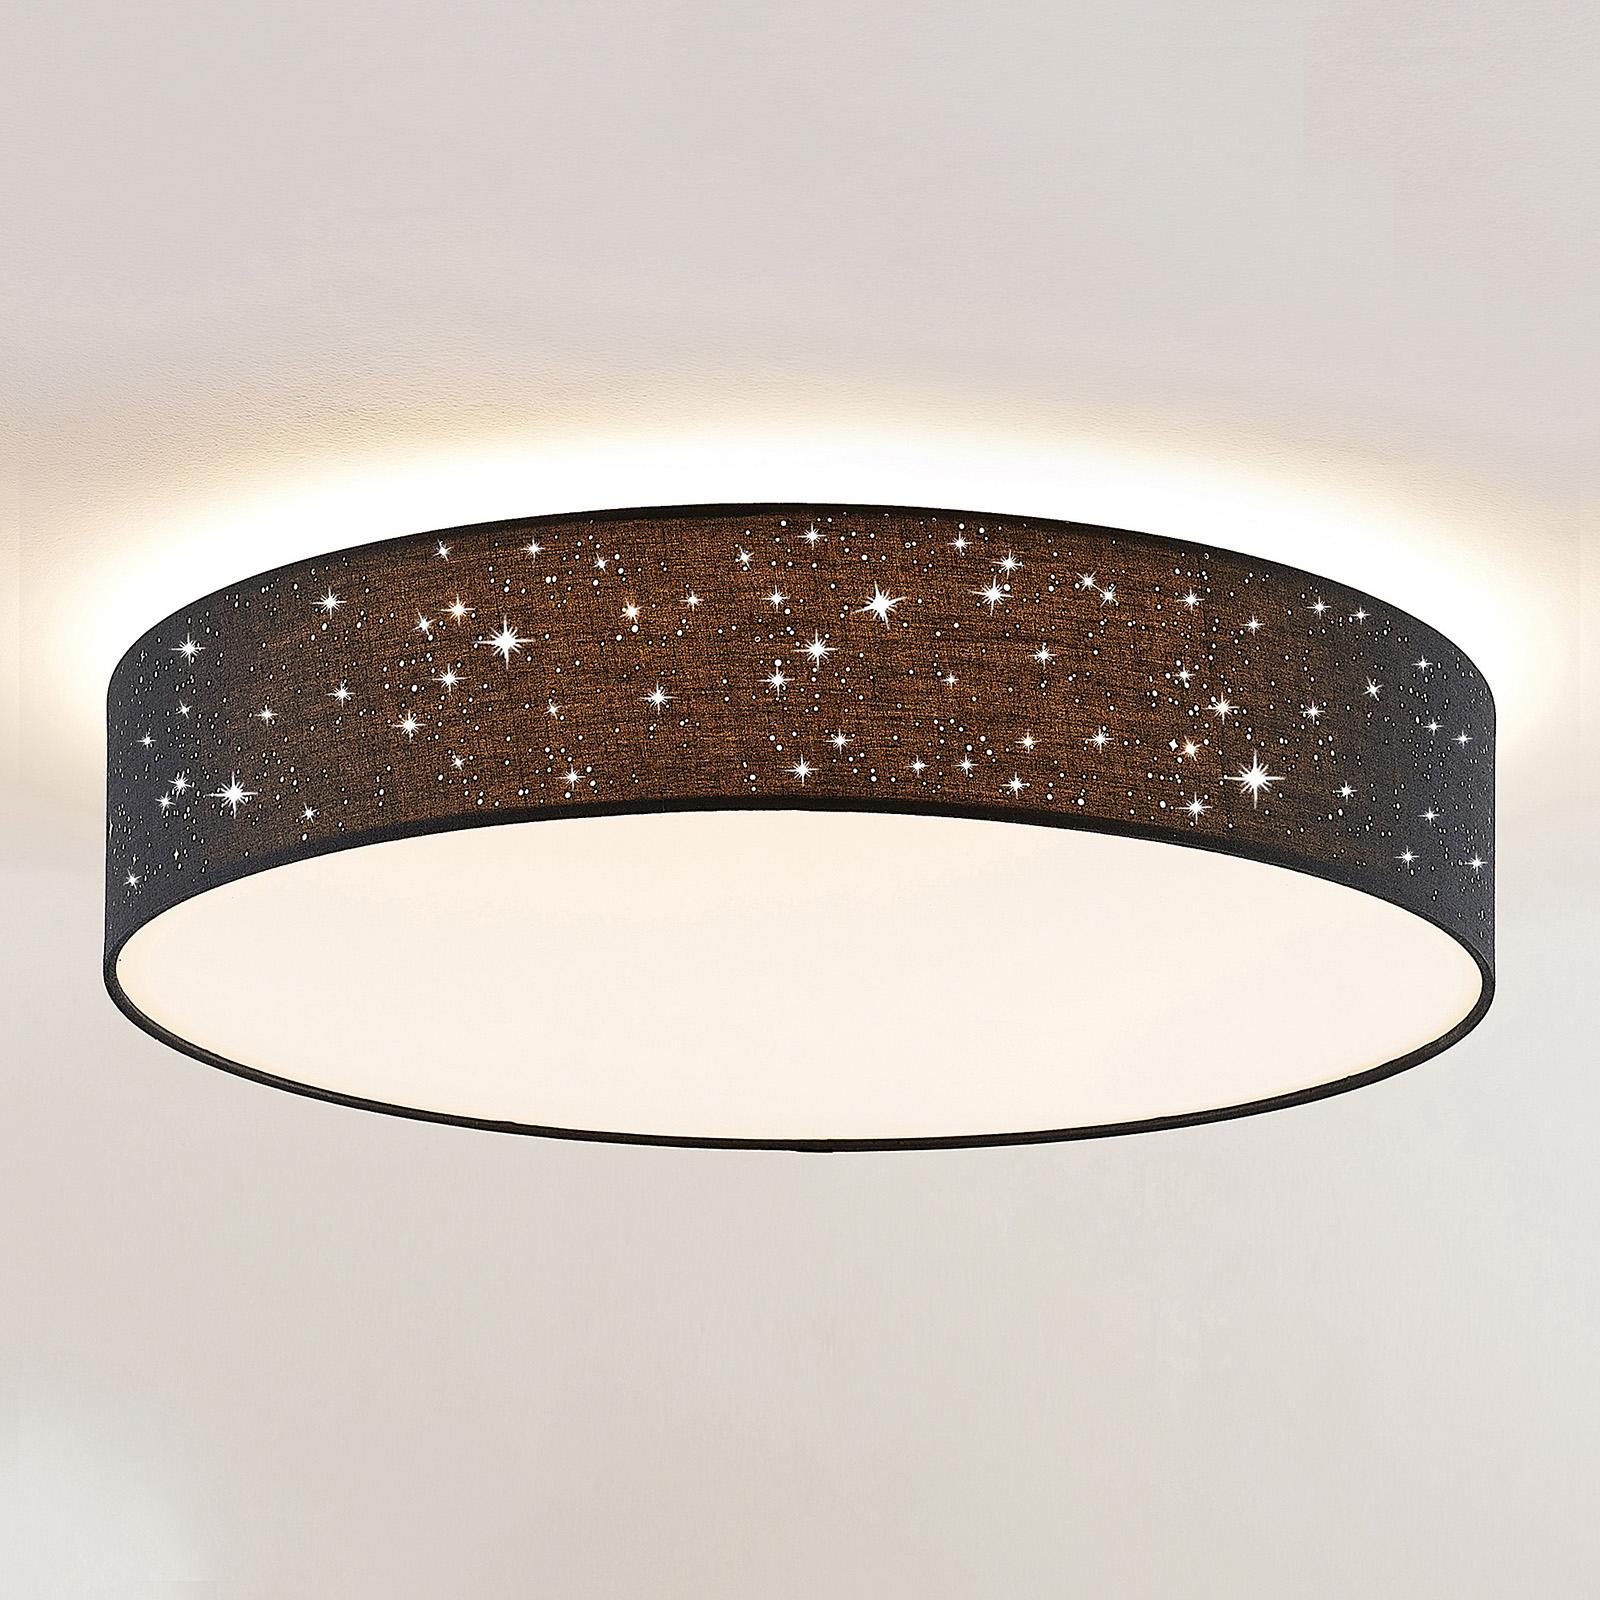 Lindby Ellamina -LED-kattovalaisin, 60 cm, musta